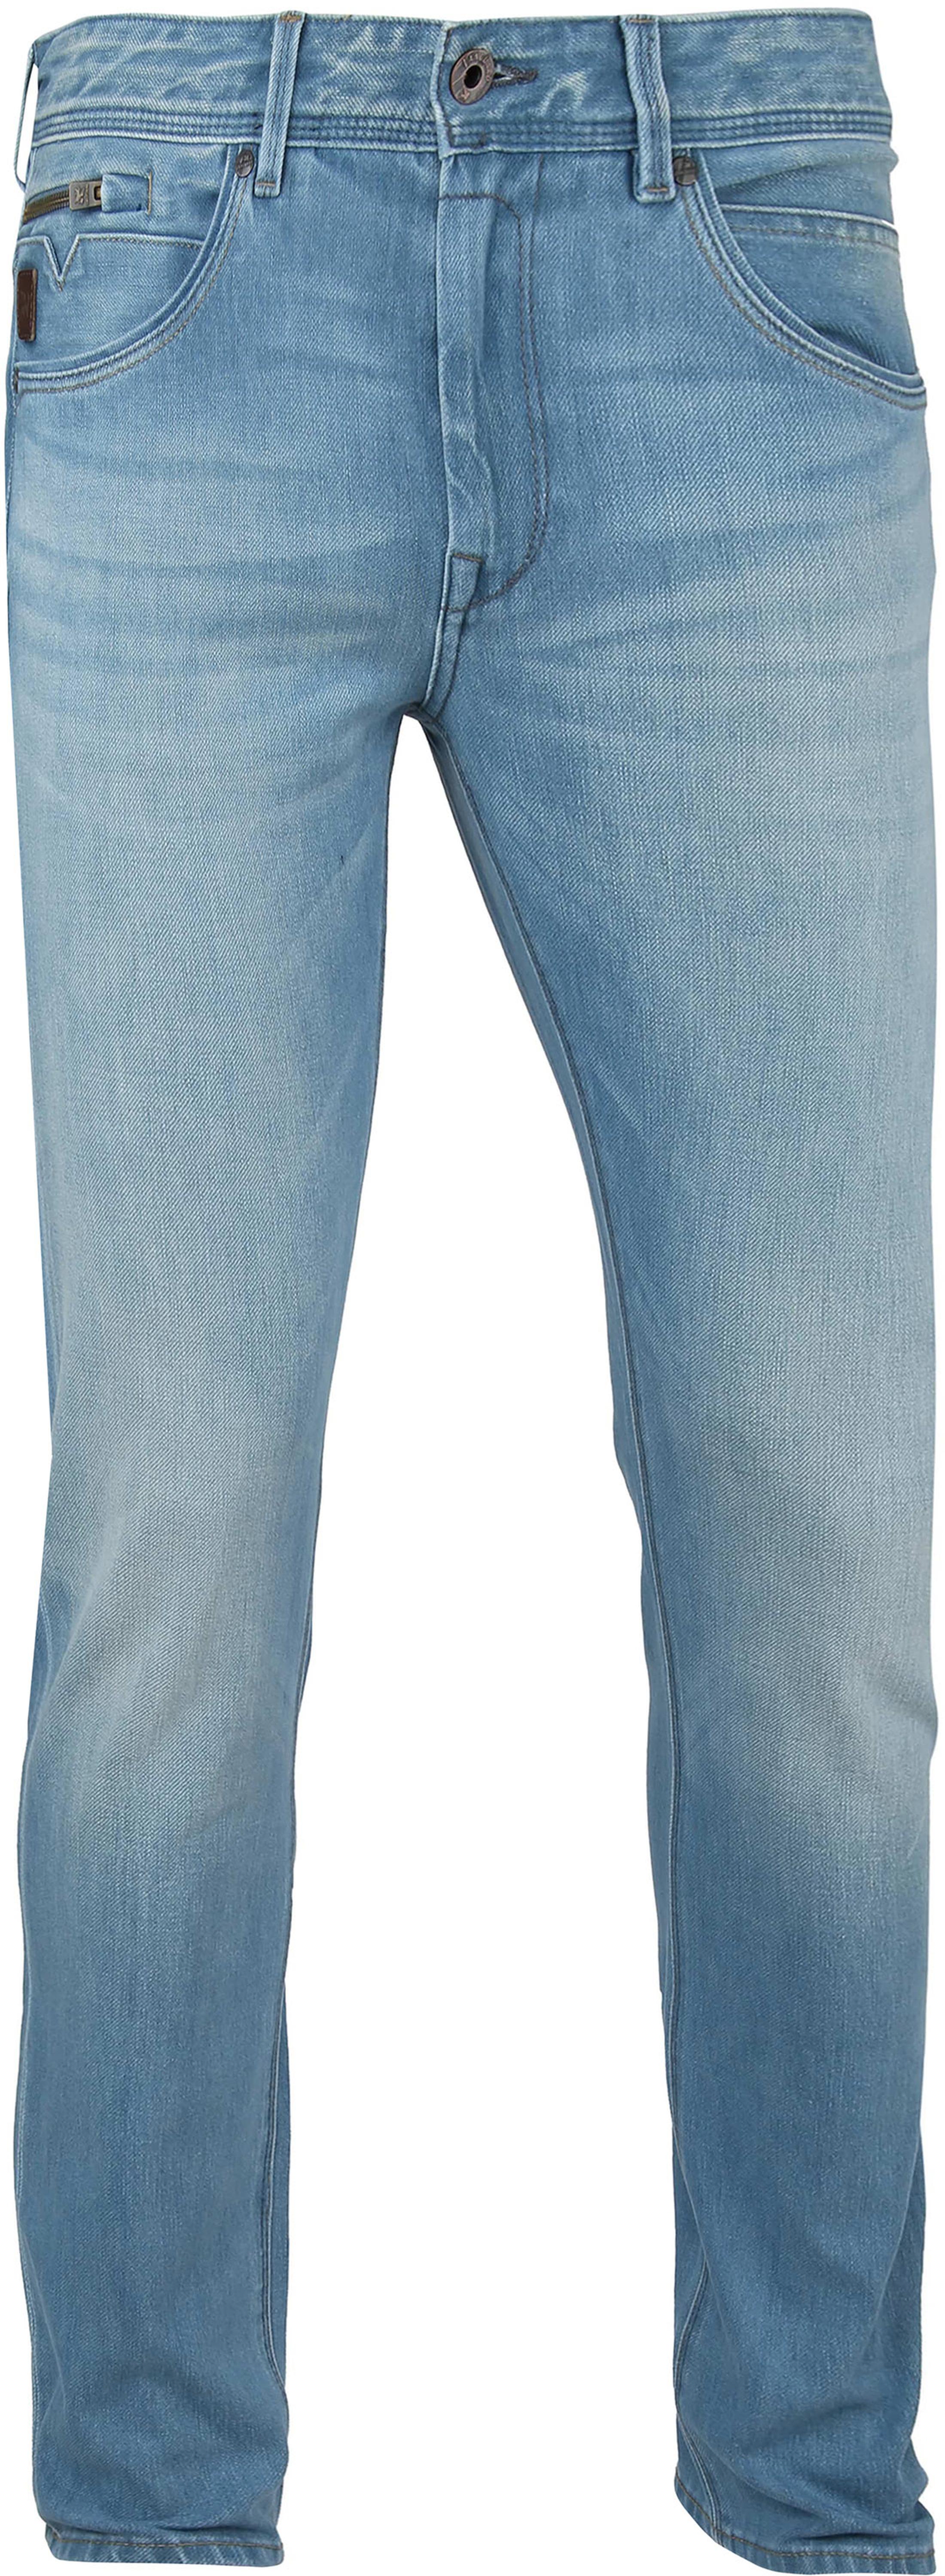 Vanguard V850 Rider Jeans SF Blue